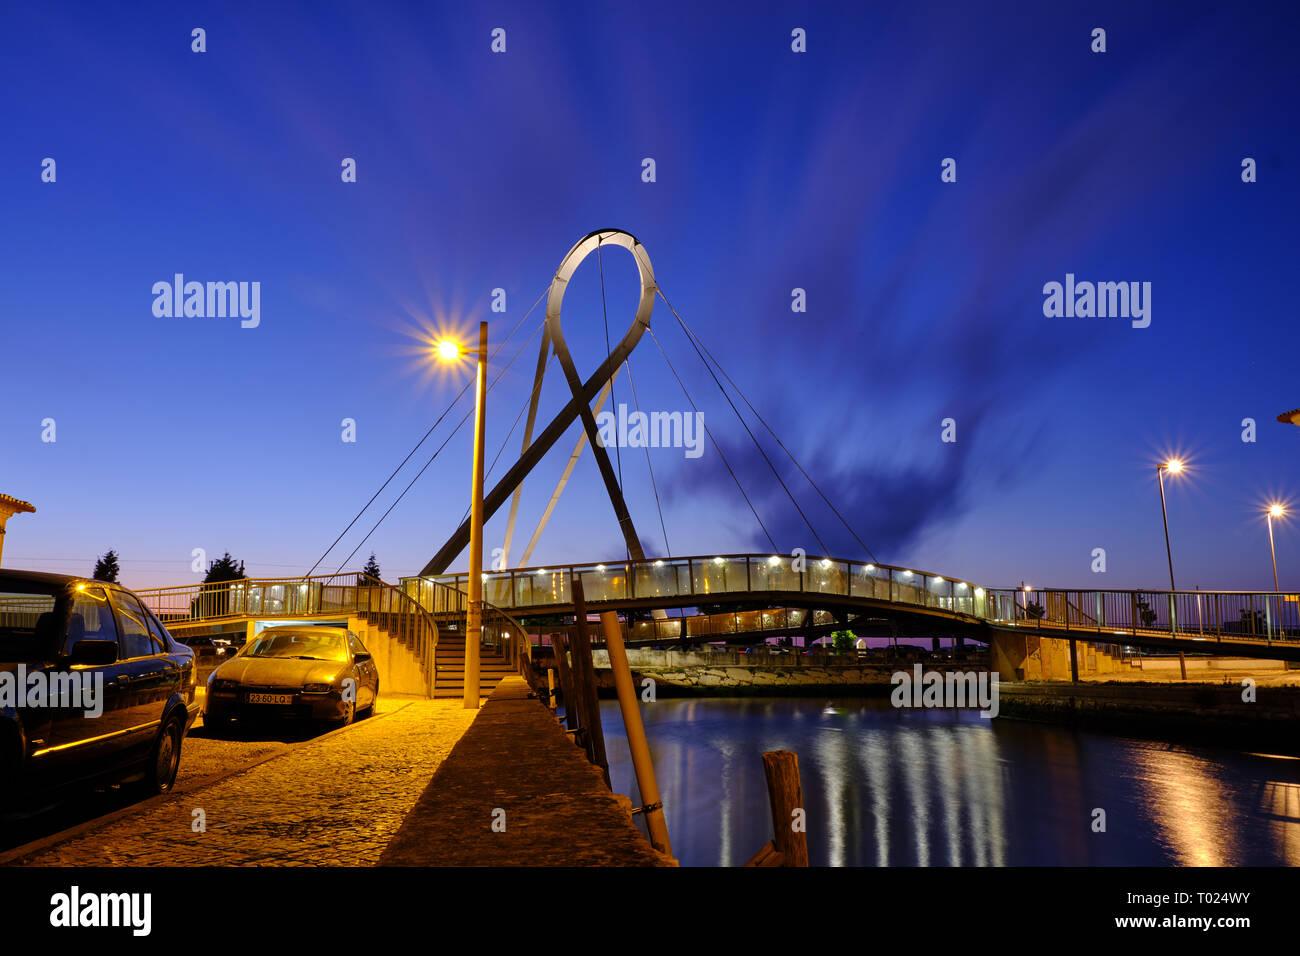 """Ponte Pedonal Circular"" (circular pedestrian bridge) in Aveiro seen from canal during blue hour. Long exposure. In Aveiro Portugal, June 22, 2017 Stock Photo"